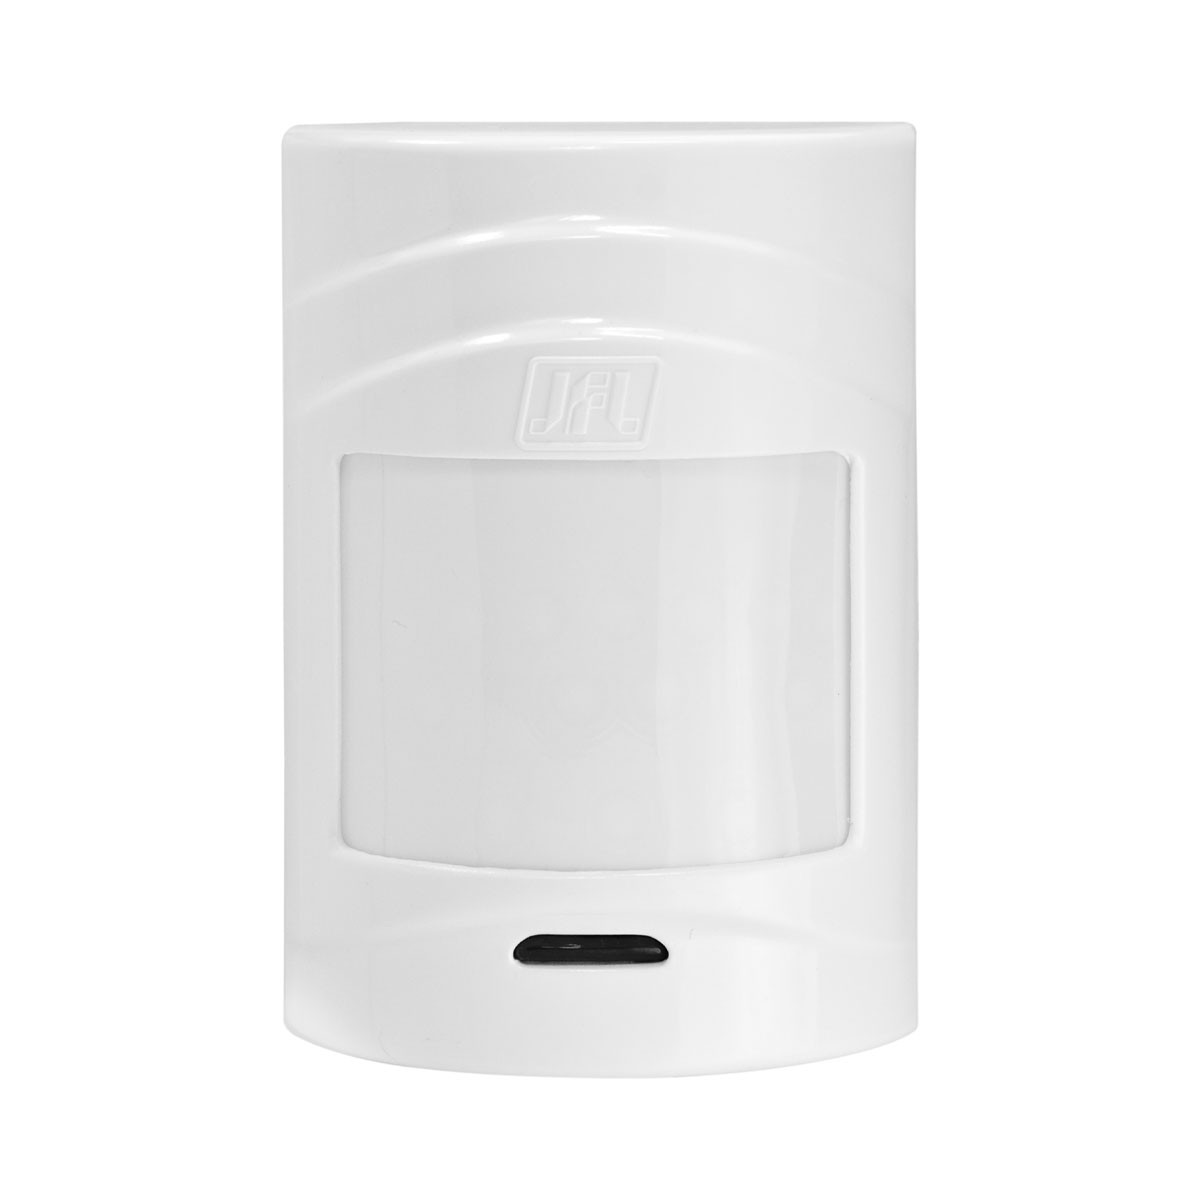 Kit Alarme SmartCloud 18 Jfl 5 Sensores Sem Fio IrPet 530Sf